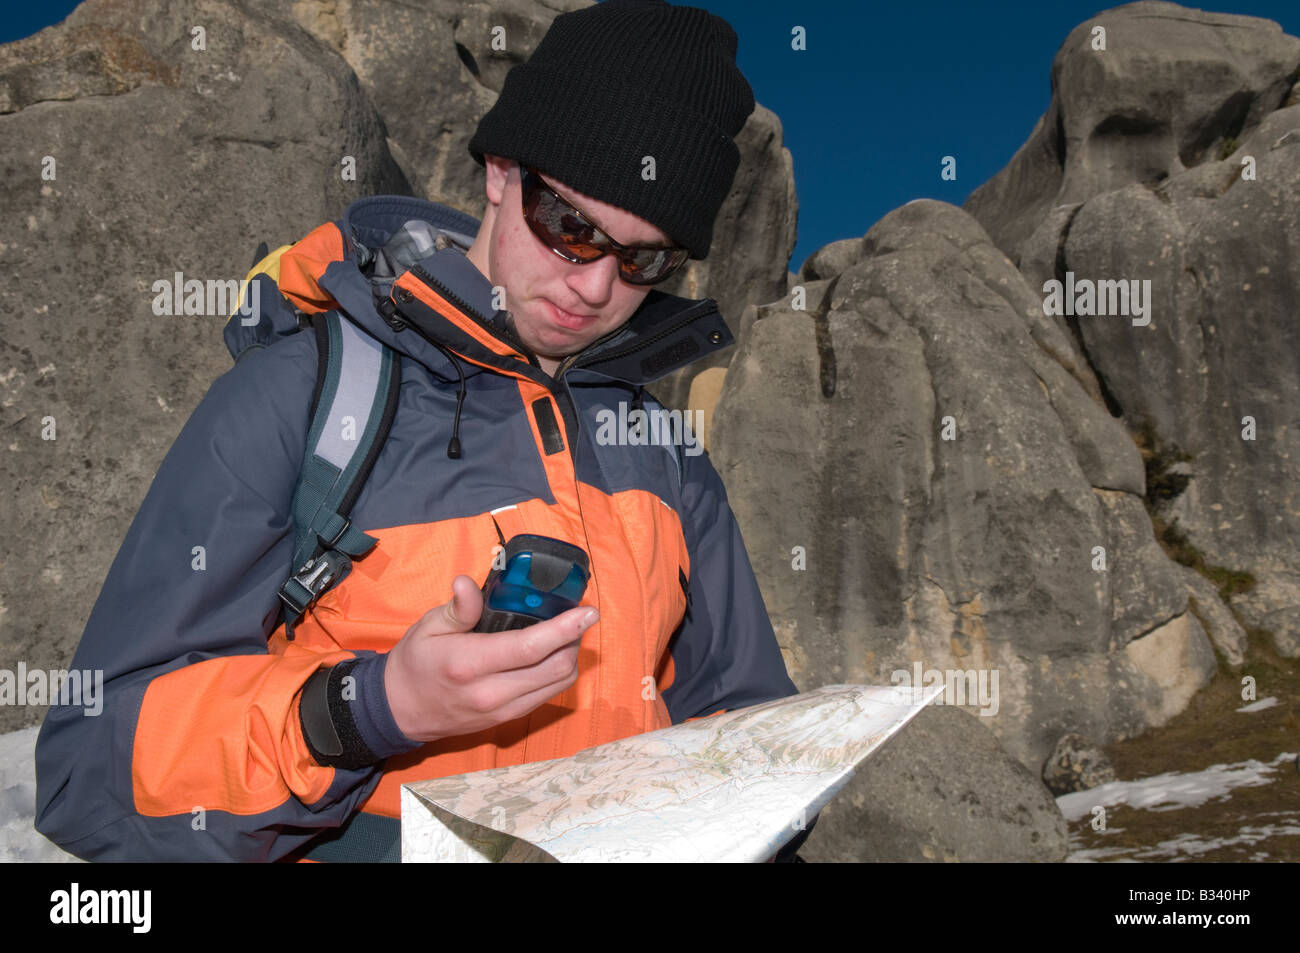 Winter hiker checks map against GPS - Stock Image